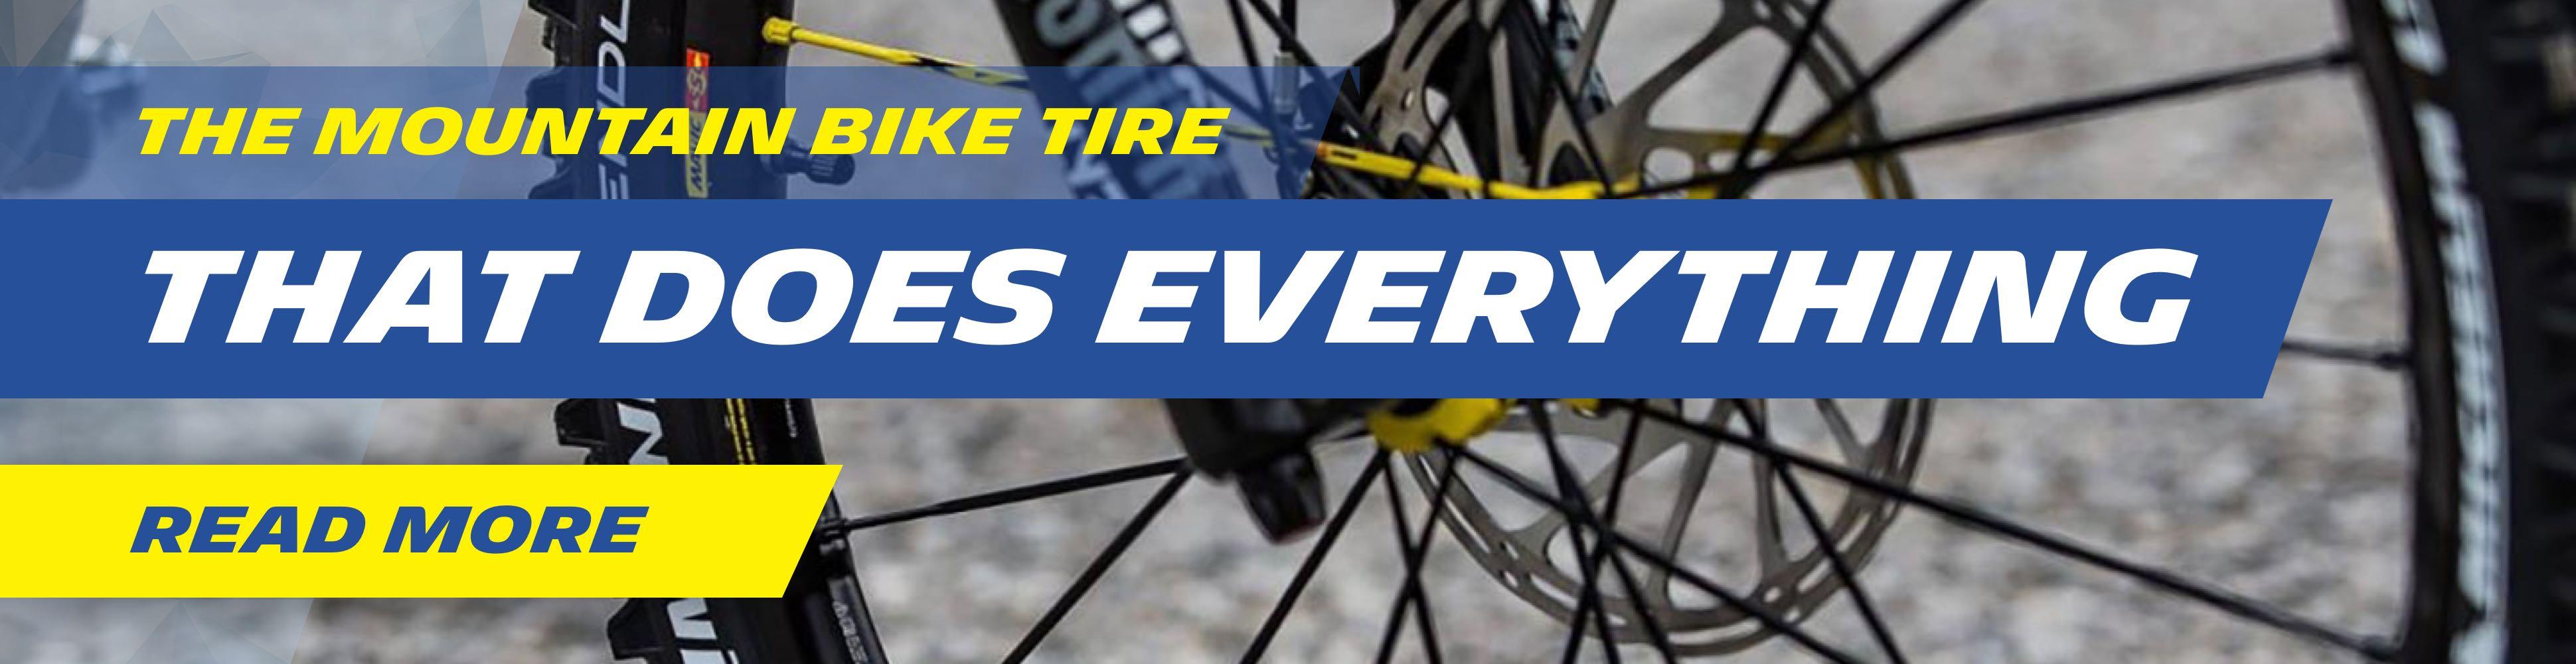 Michelin Wild Enduro mountain bike tire